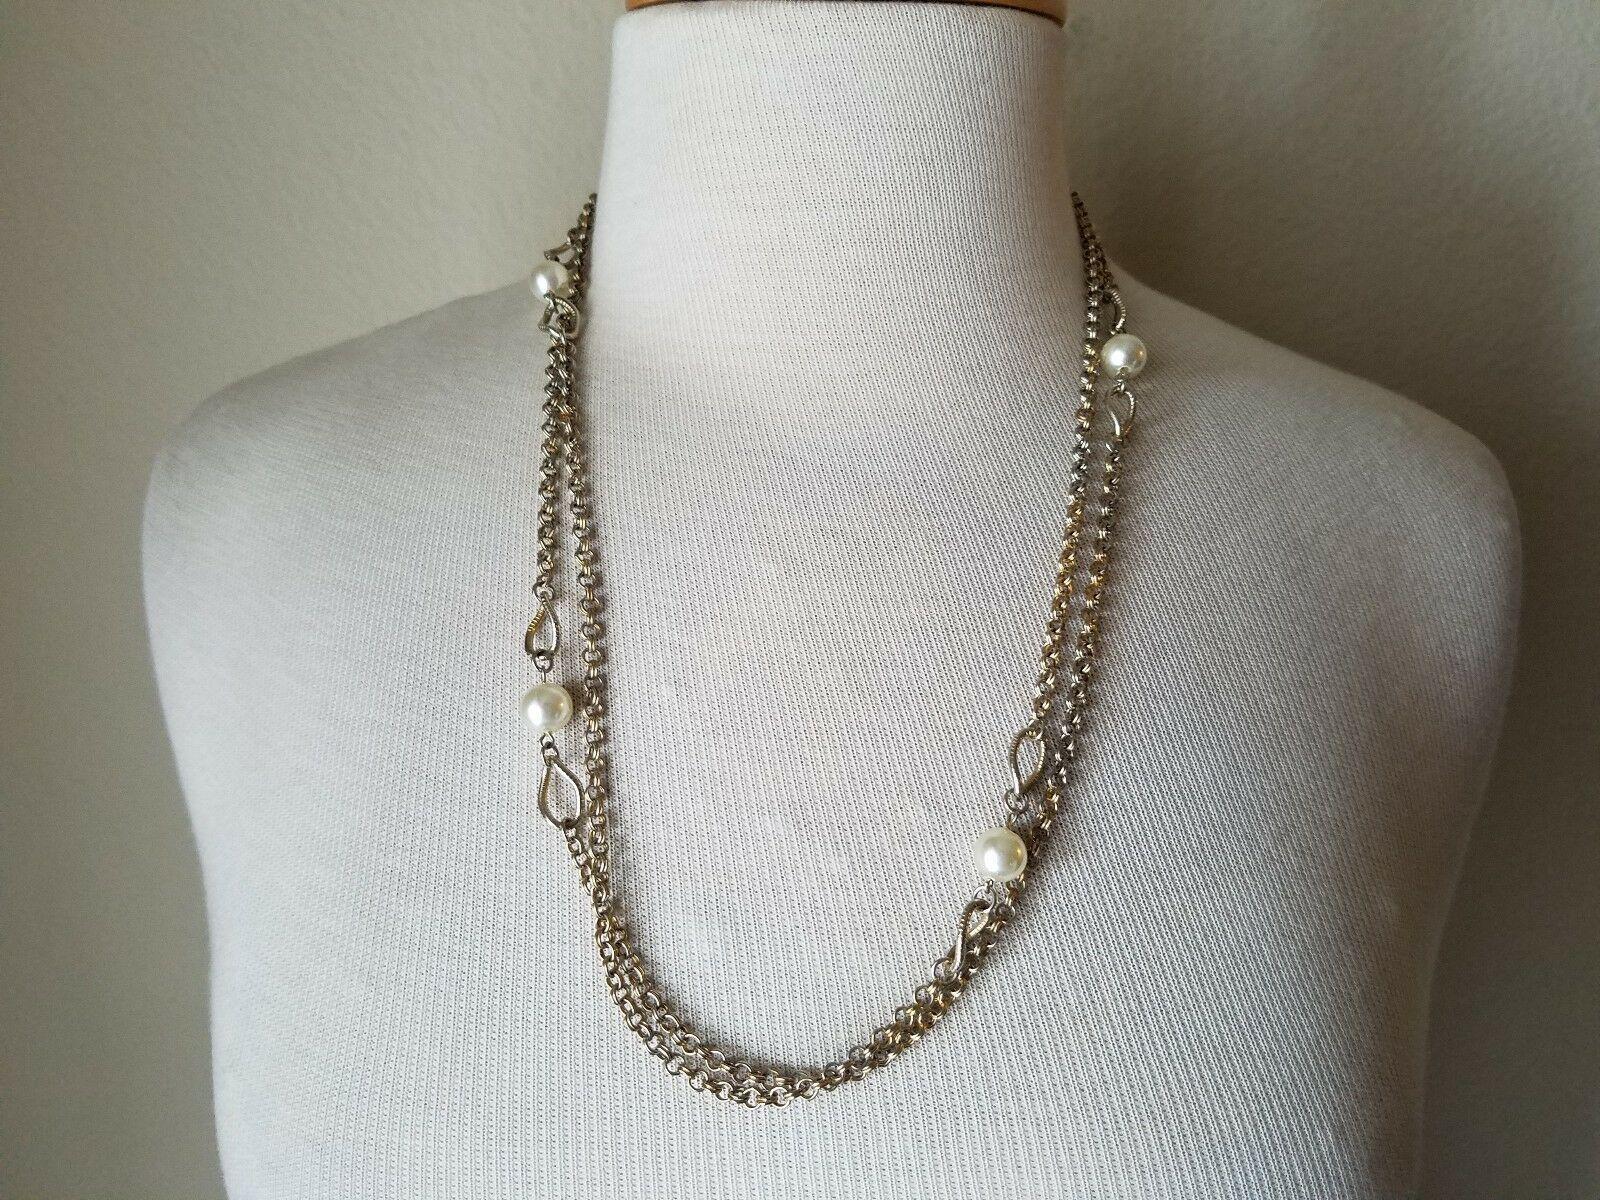 Vintage Fashion Jewelry Set Silver Tone Metal Faux Pearl Earrings & Neclace